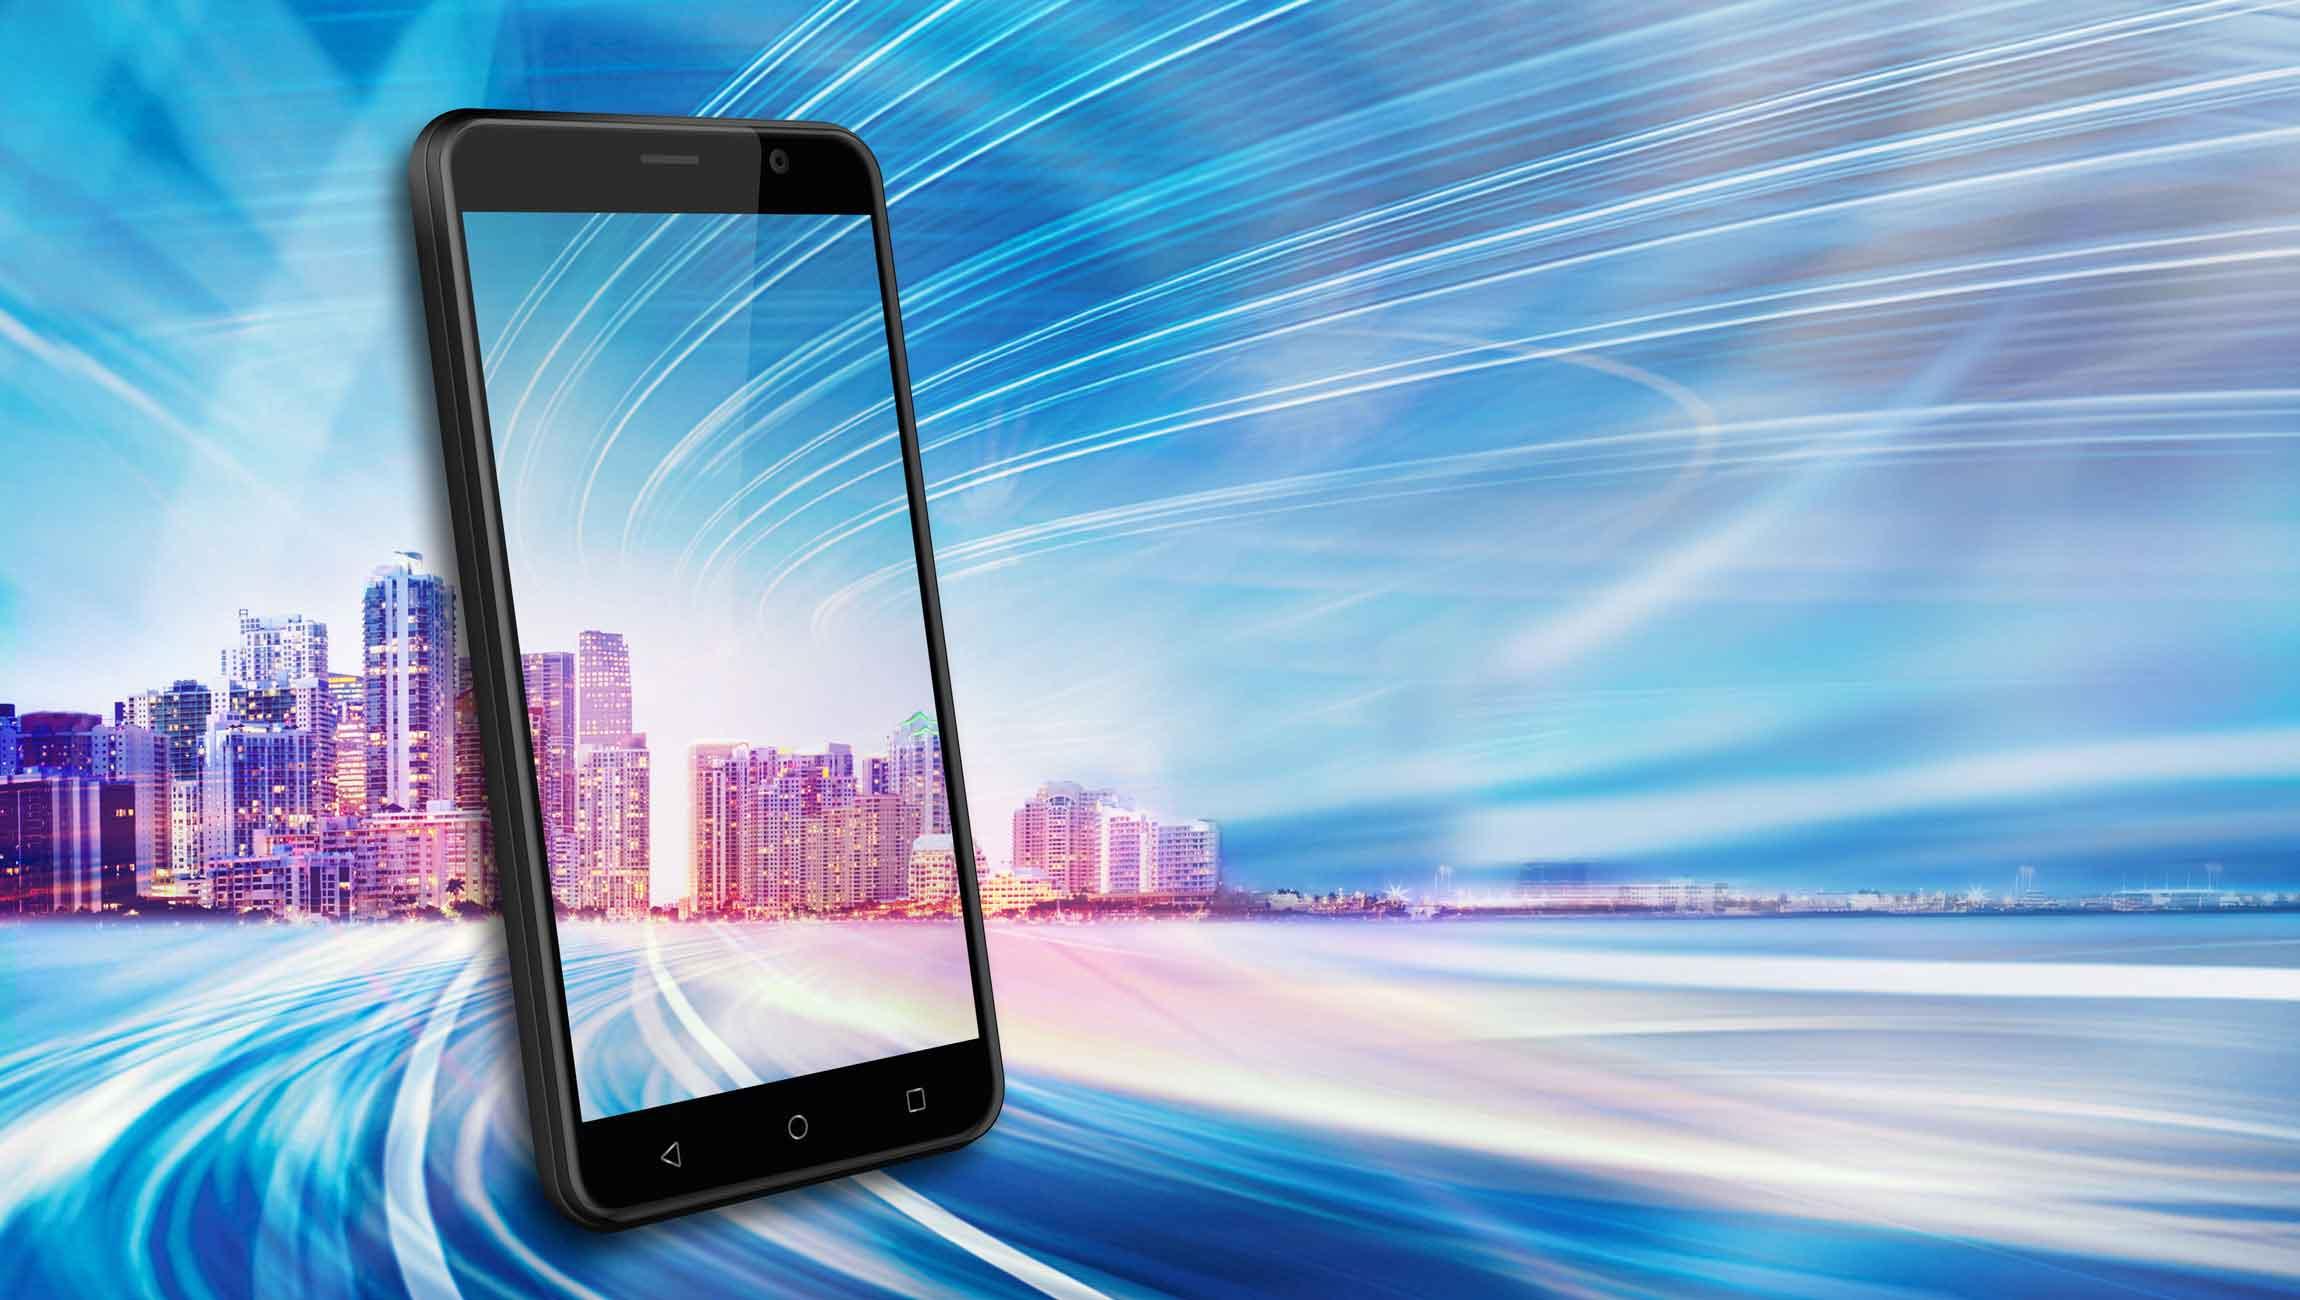 AT E500S 4G - گوشی موبایل انرجایزر مدل Energizer Energy E500S با ظرفیت ۸ گیگابایت